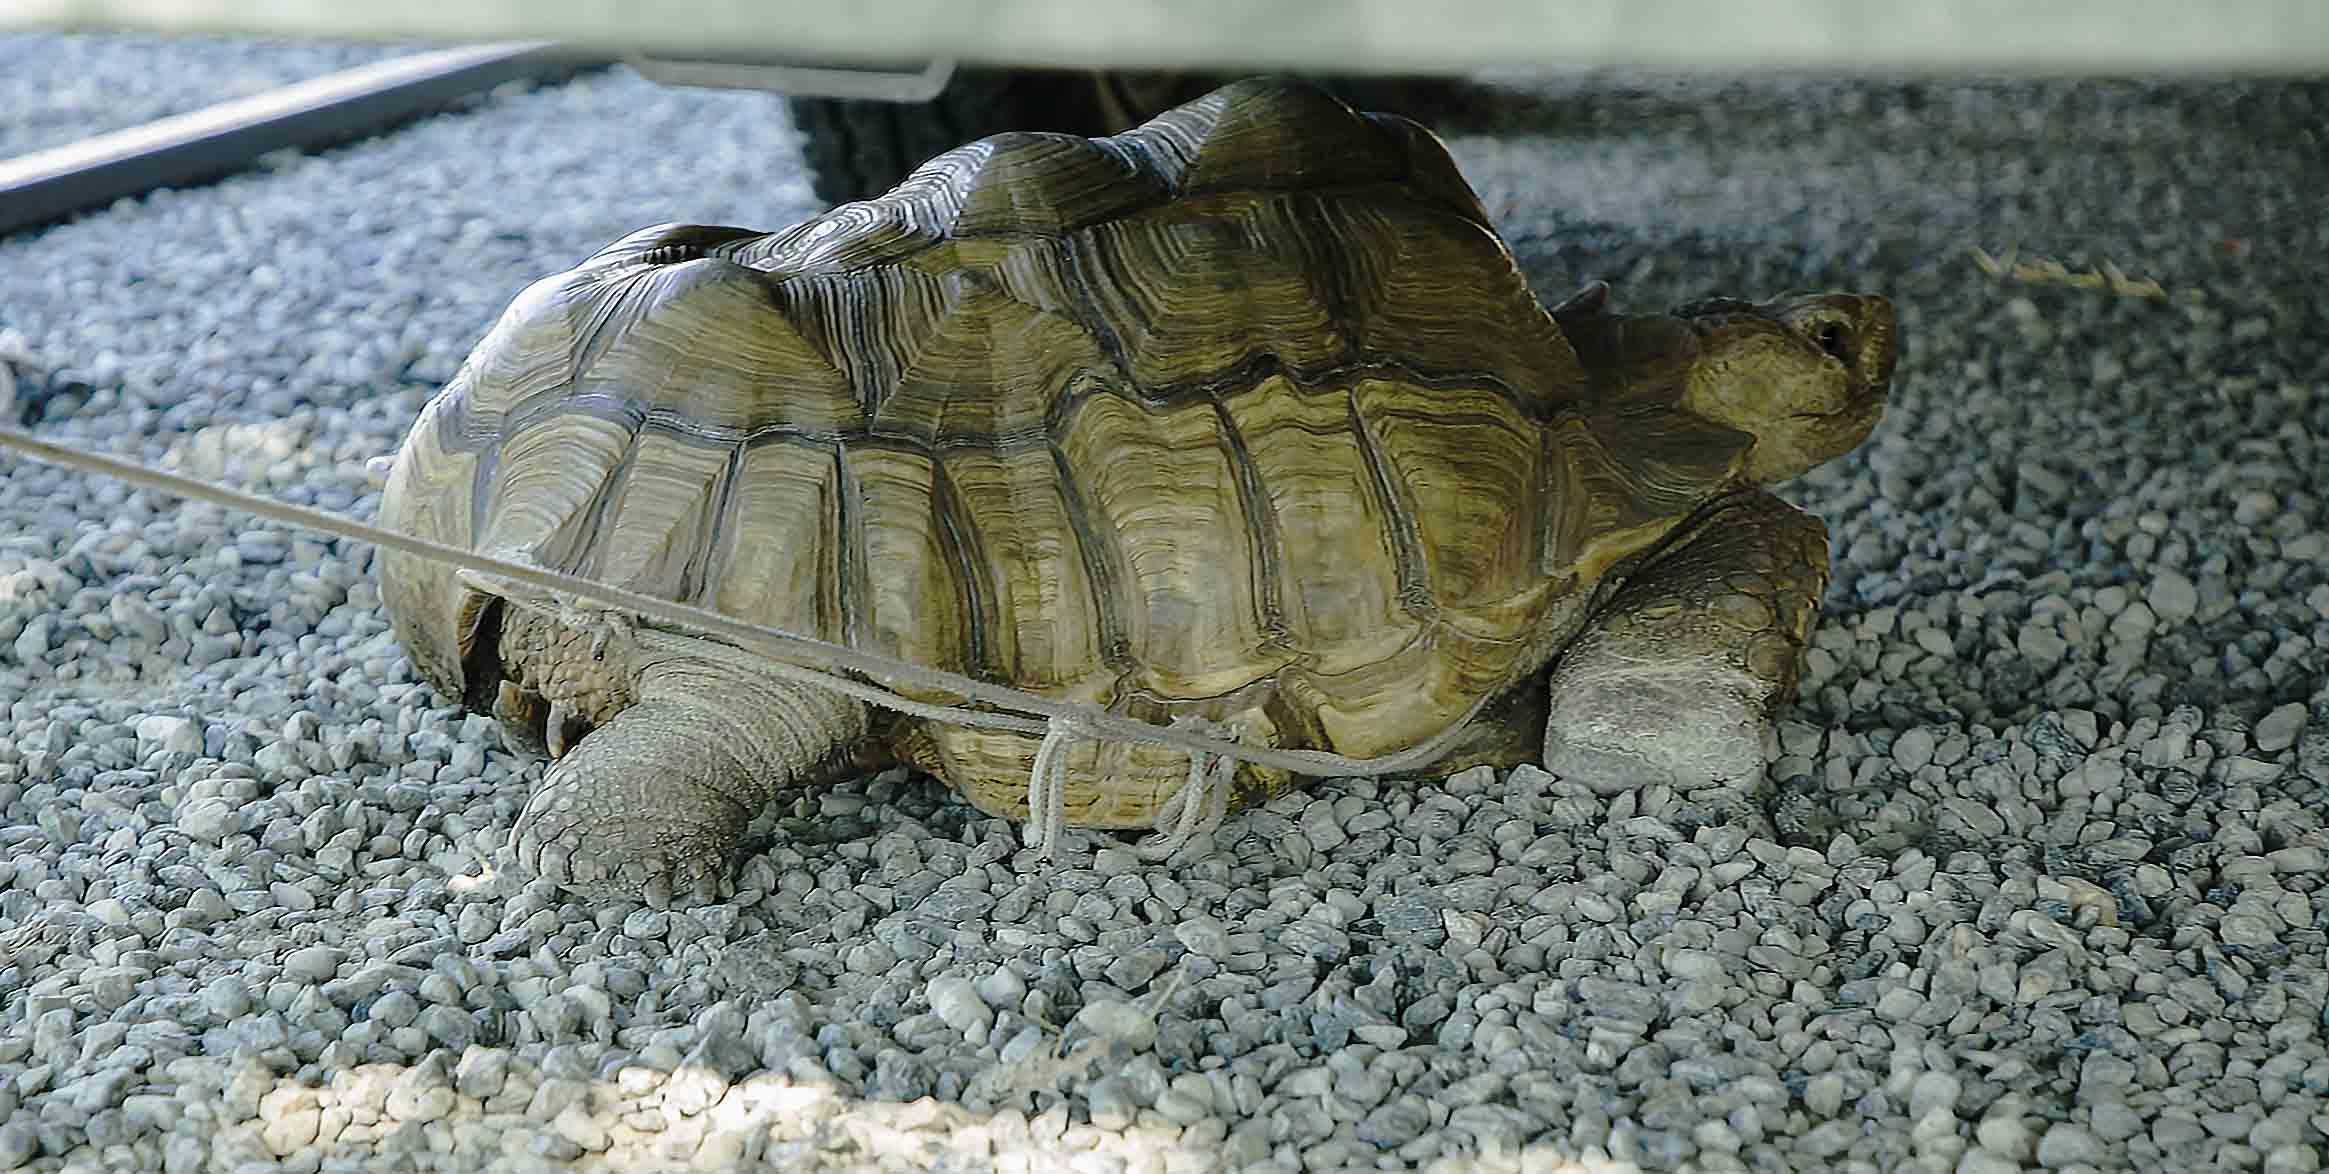 Uga la tartaruga, fotografia di Marcella Ponassi